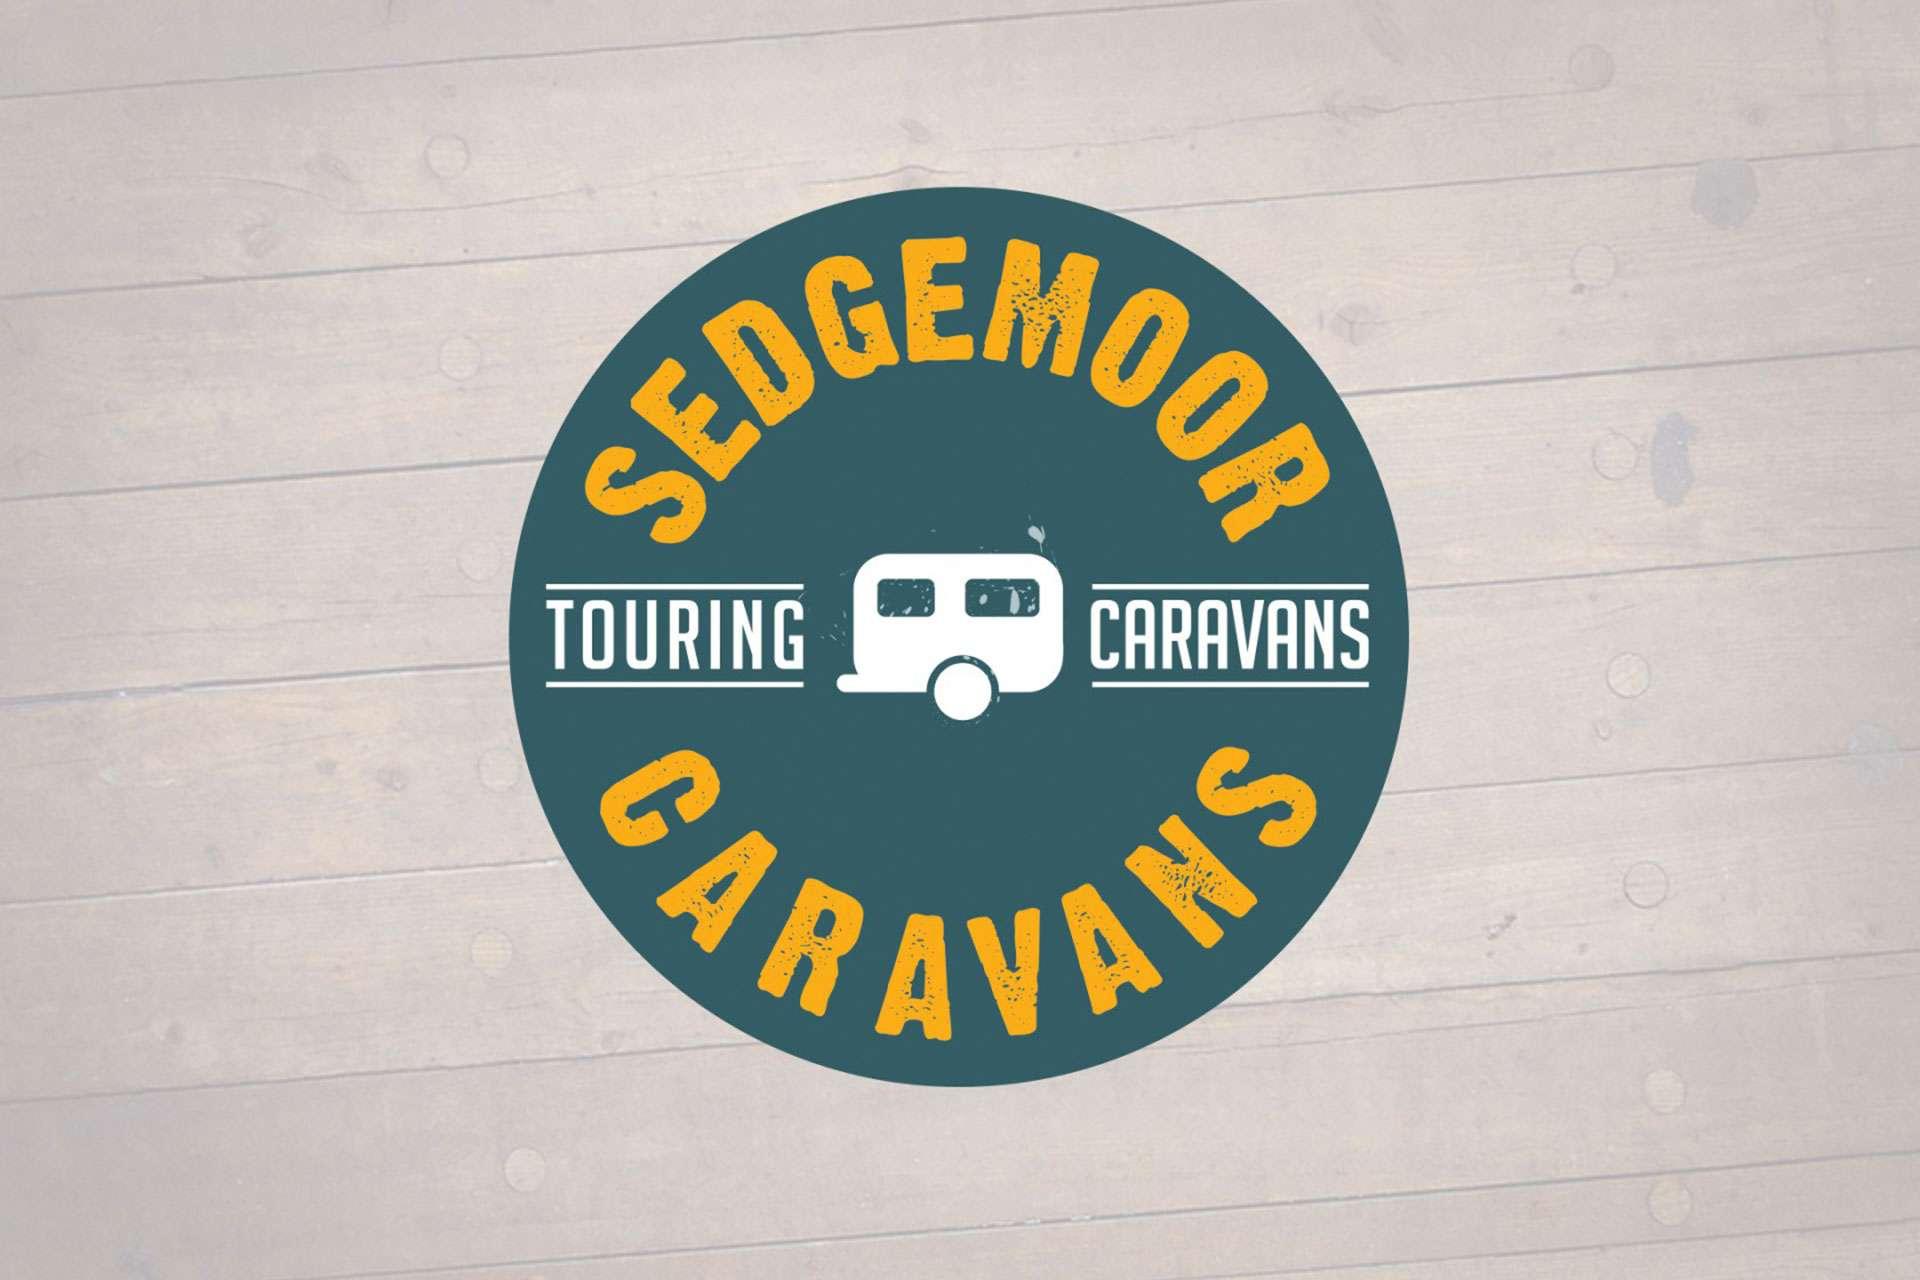 Sedgemoor caravans logo design